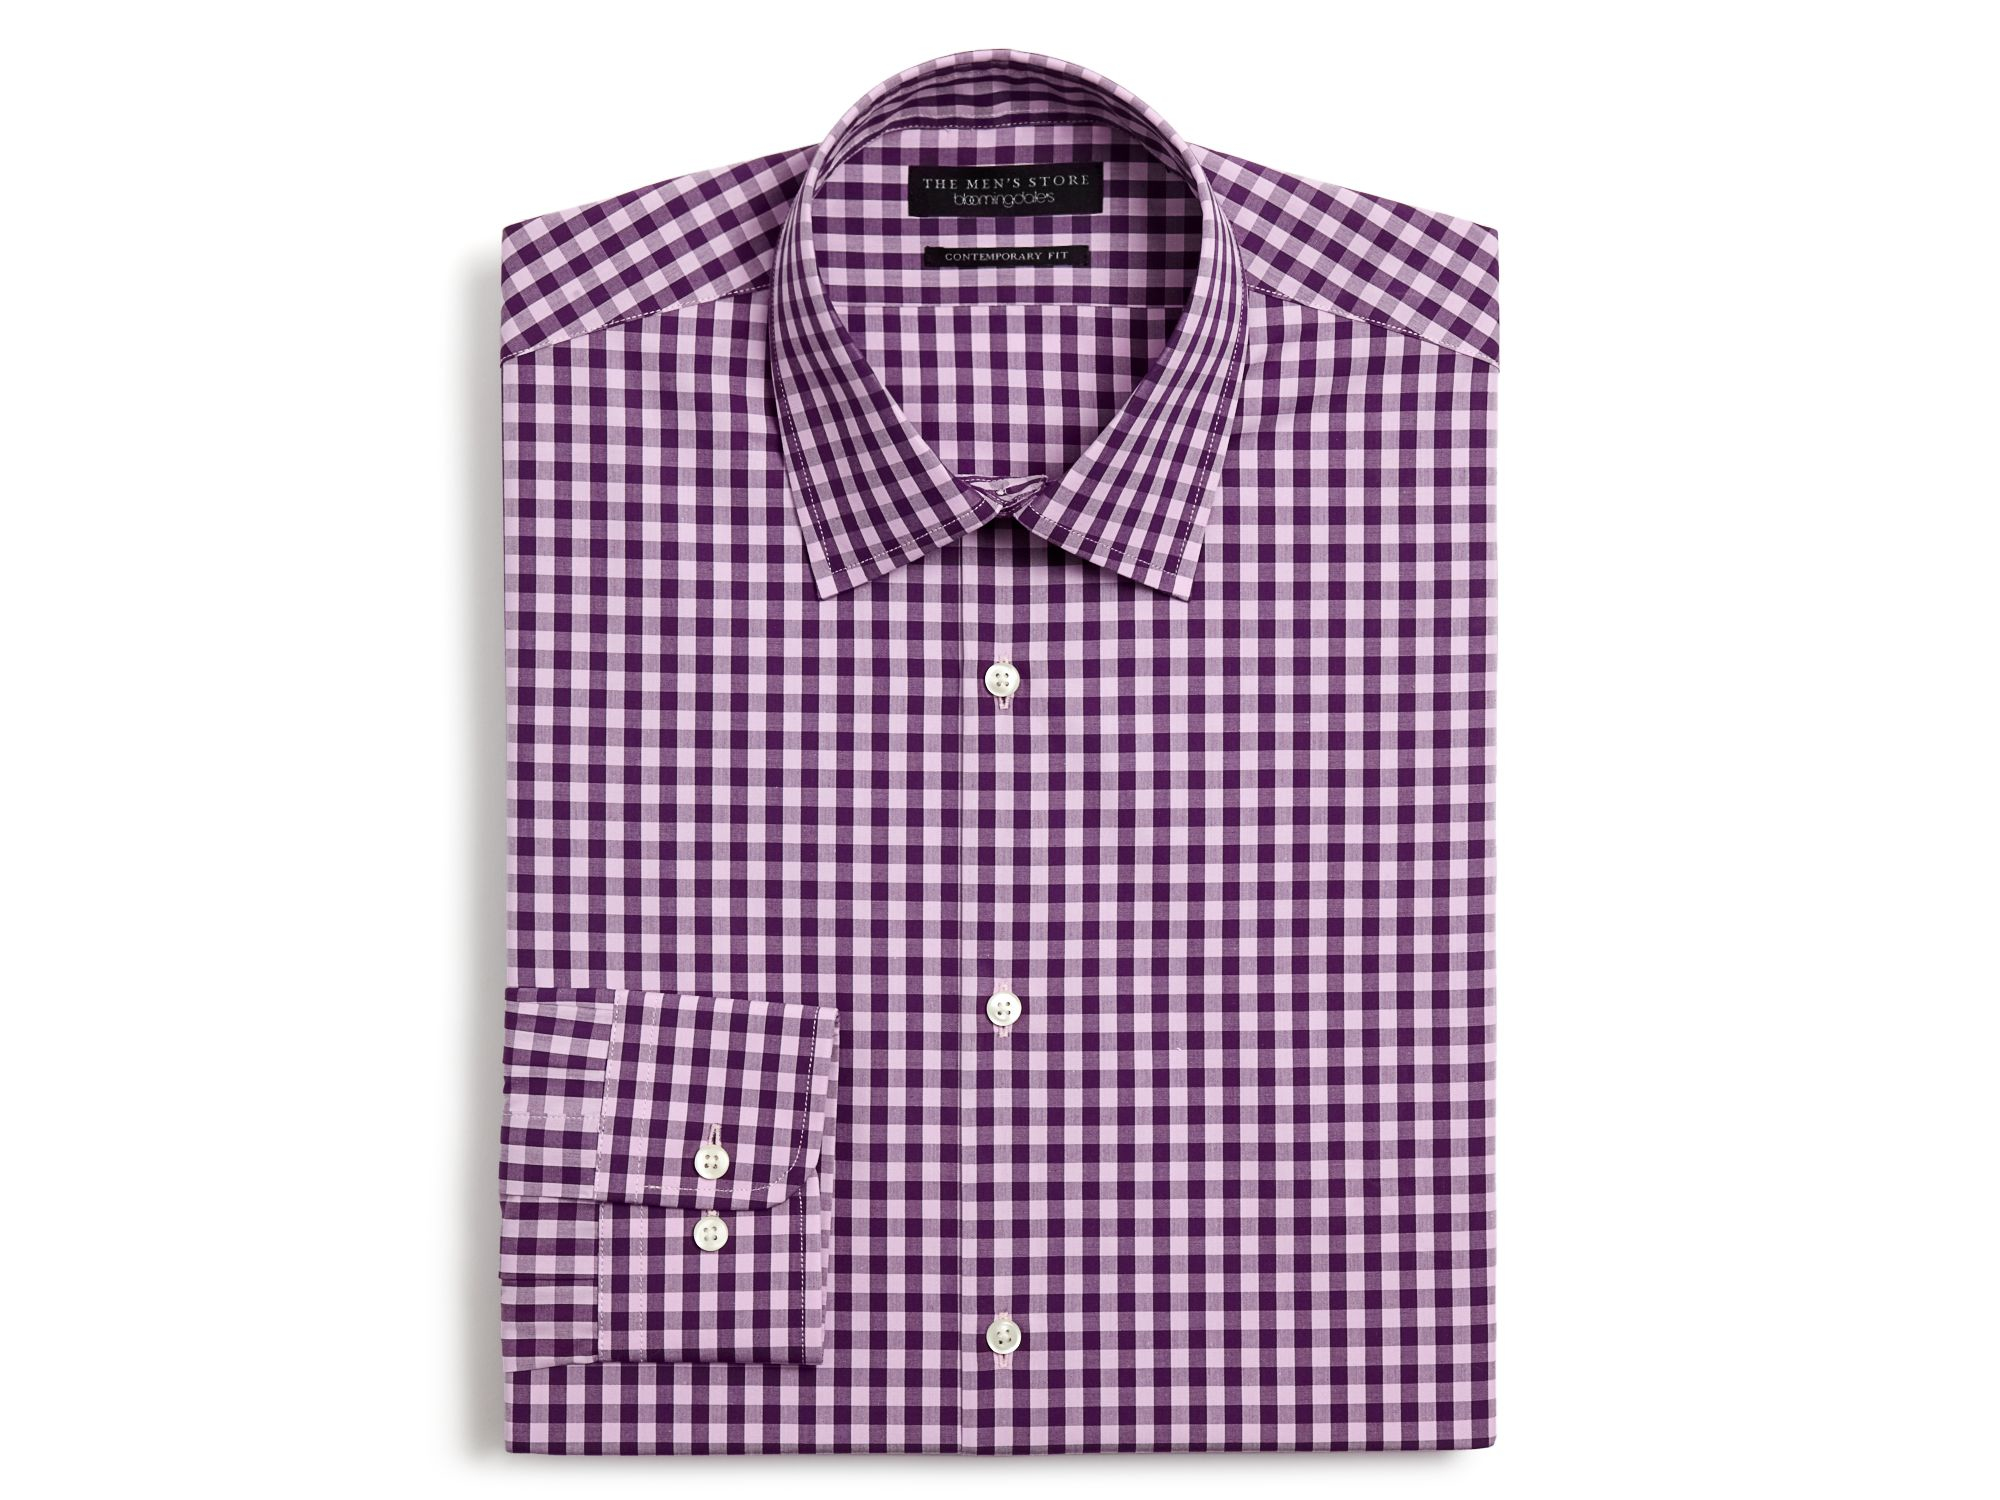 Lyst bloomingdale 39 s gingham dress shirt slim fit in for Men s red gingham dress shirt